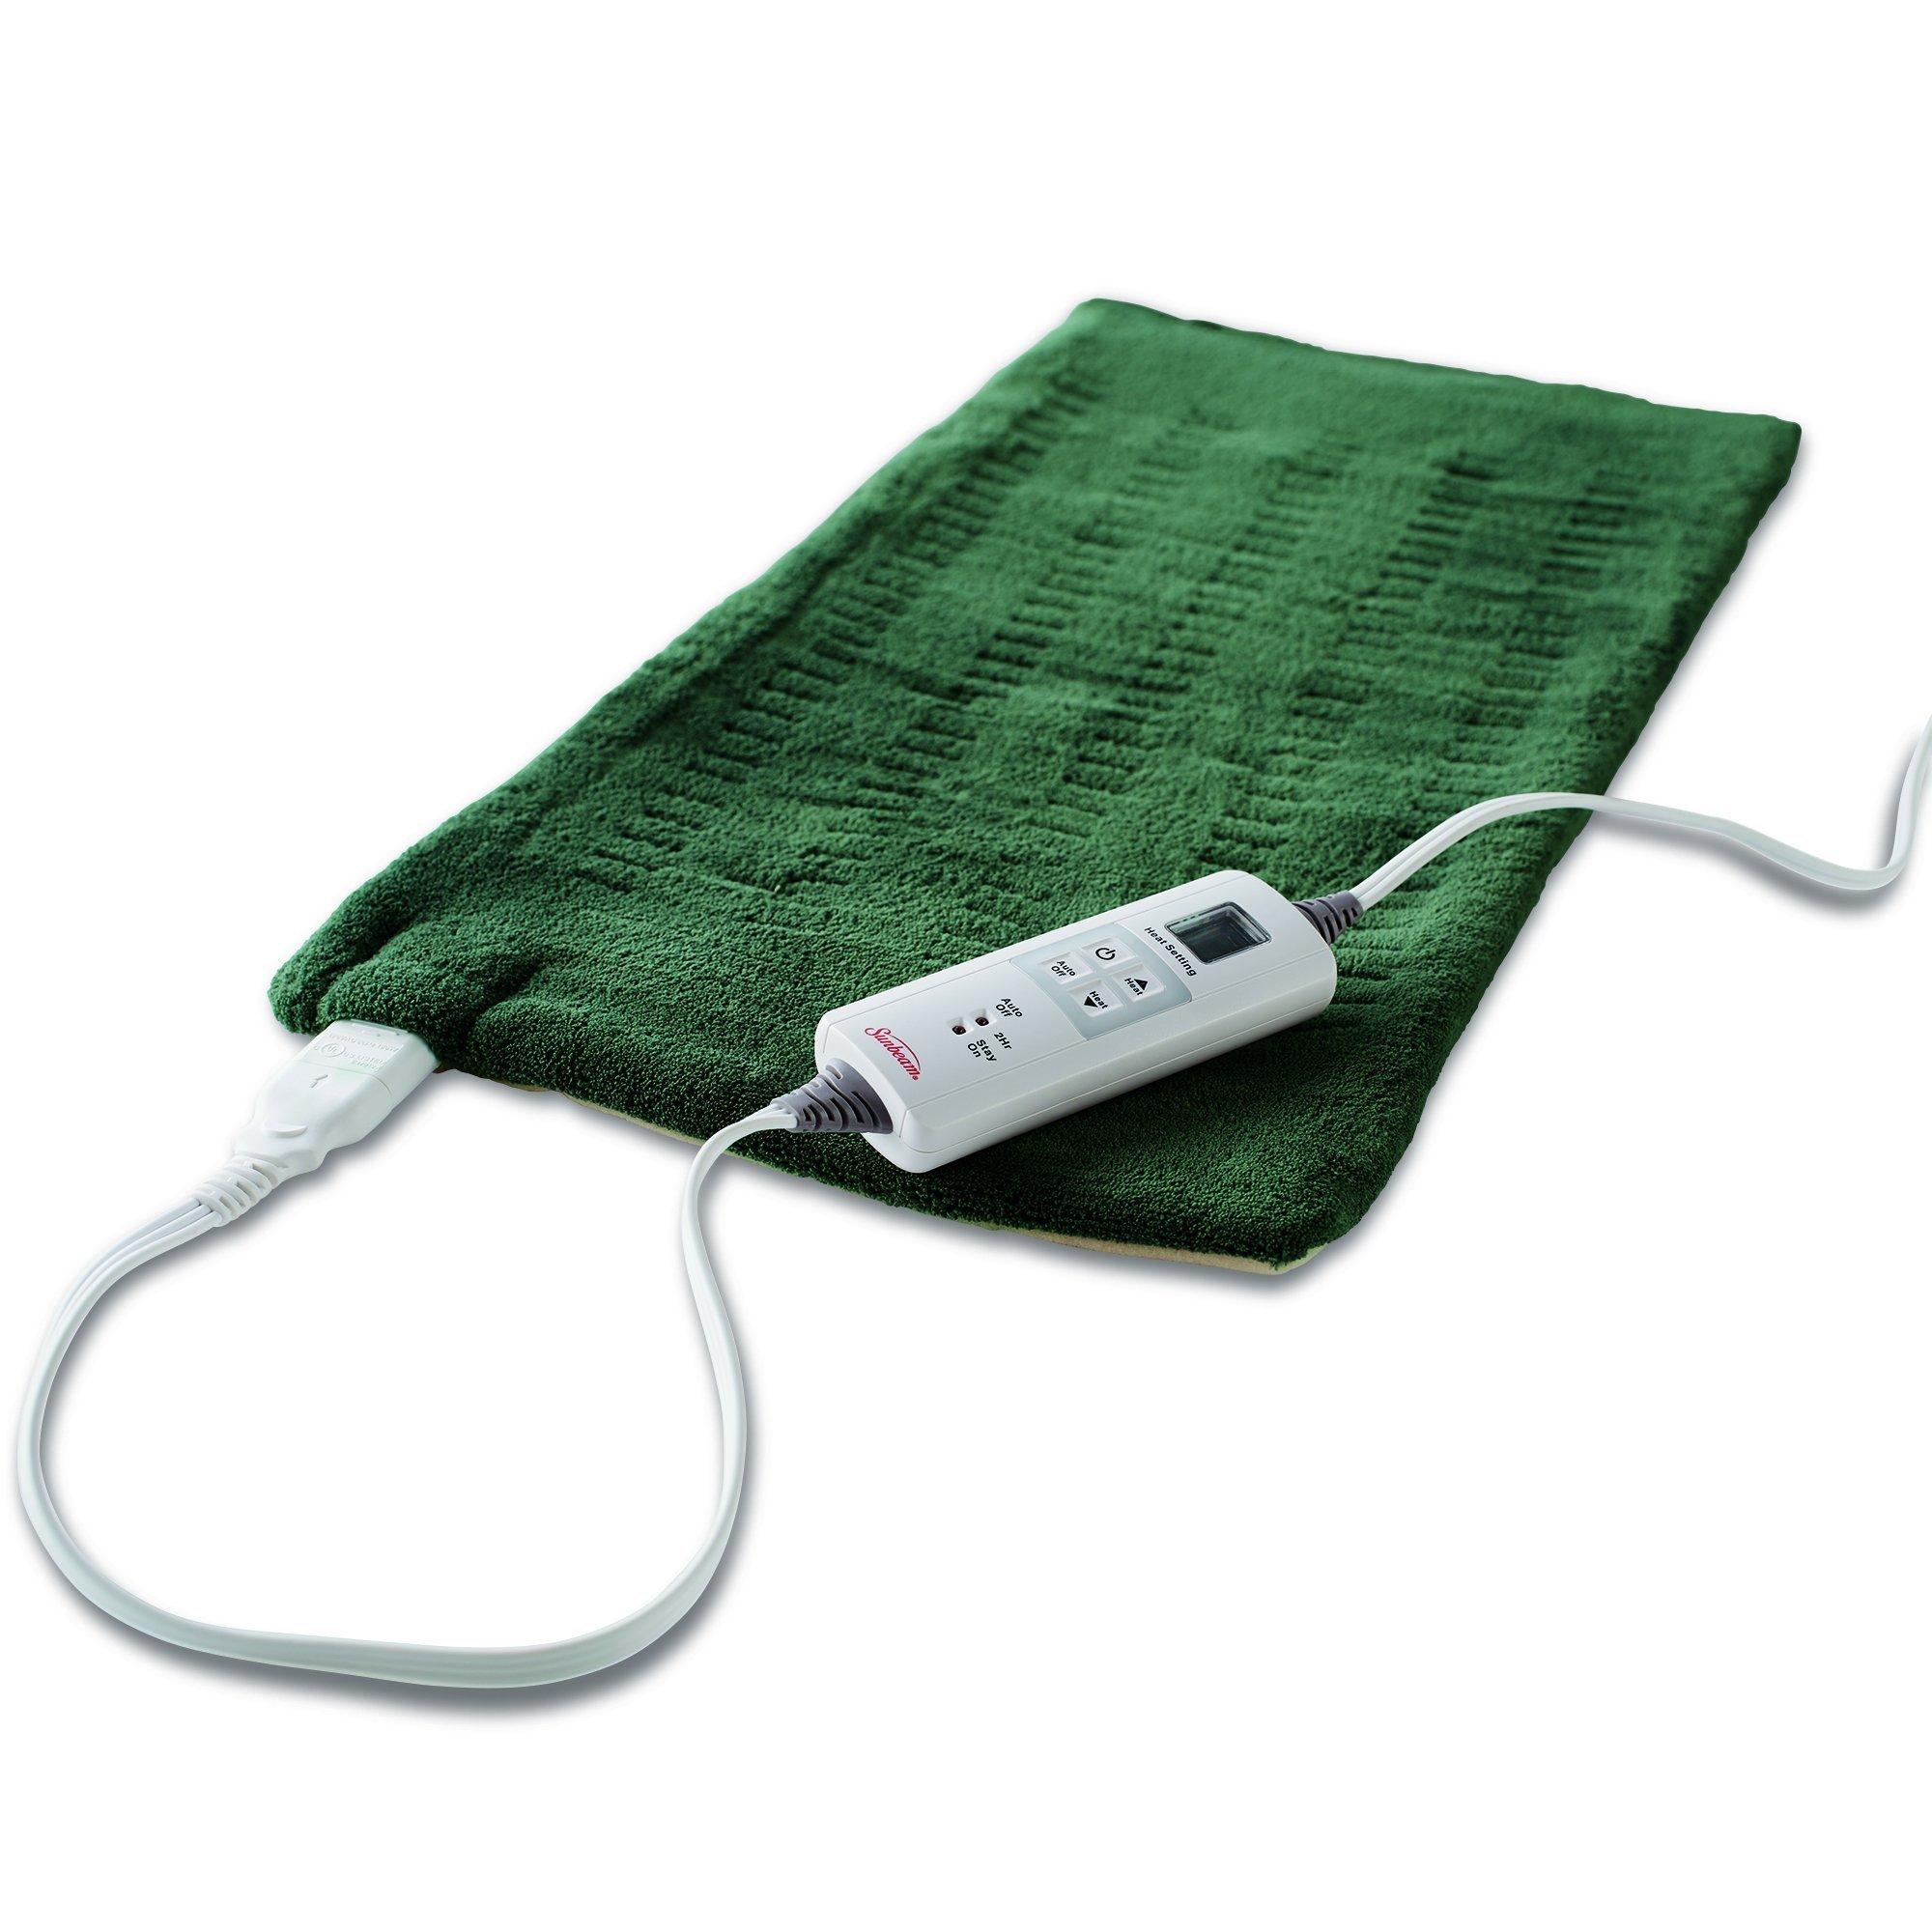 moist heat heating pad instructions